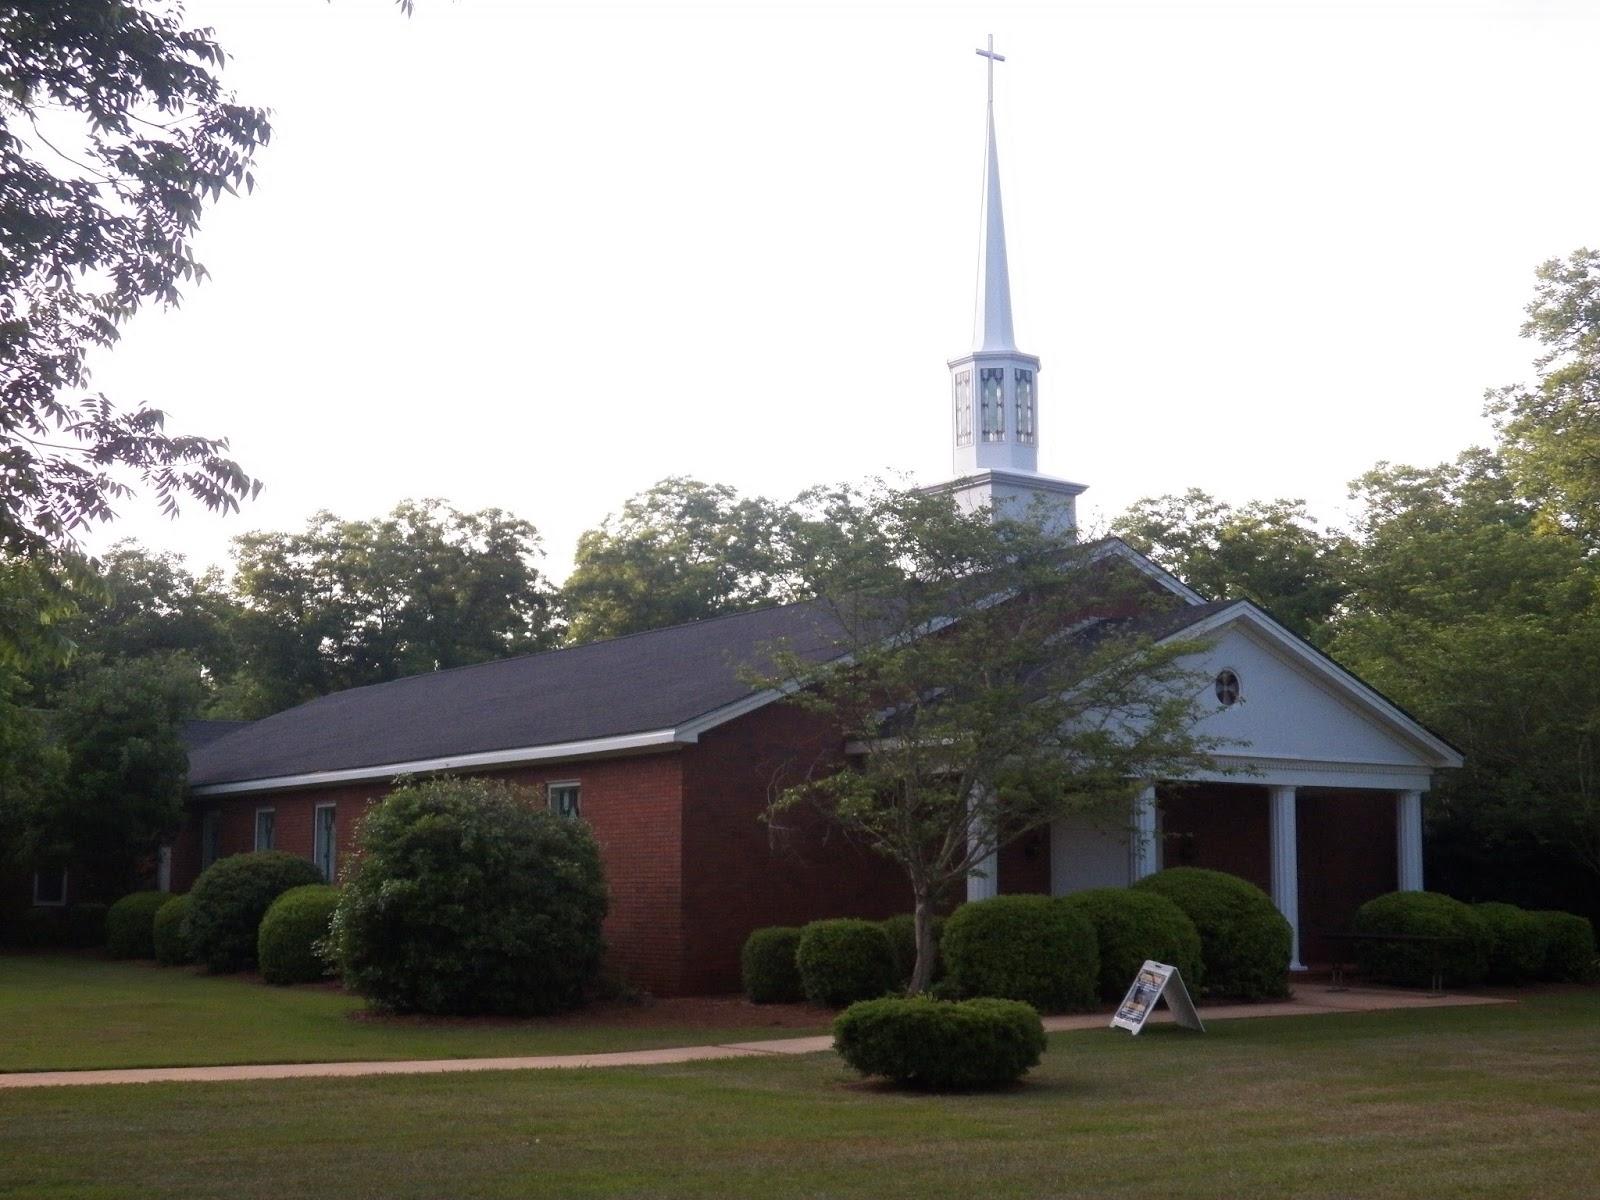 Maranatha Baptist Church Plains GACurrent Of President Carter He Teaches Sunday School Here I Got To Attend A Class In June 2013